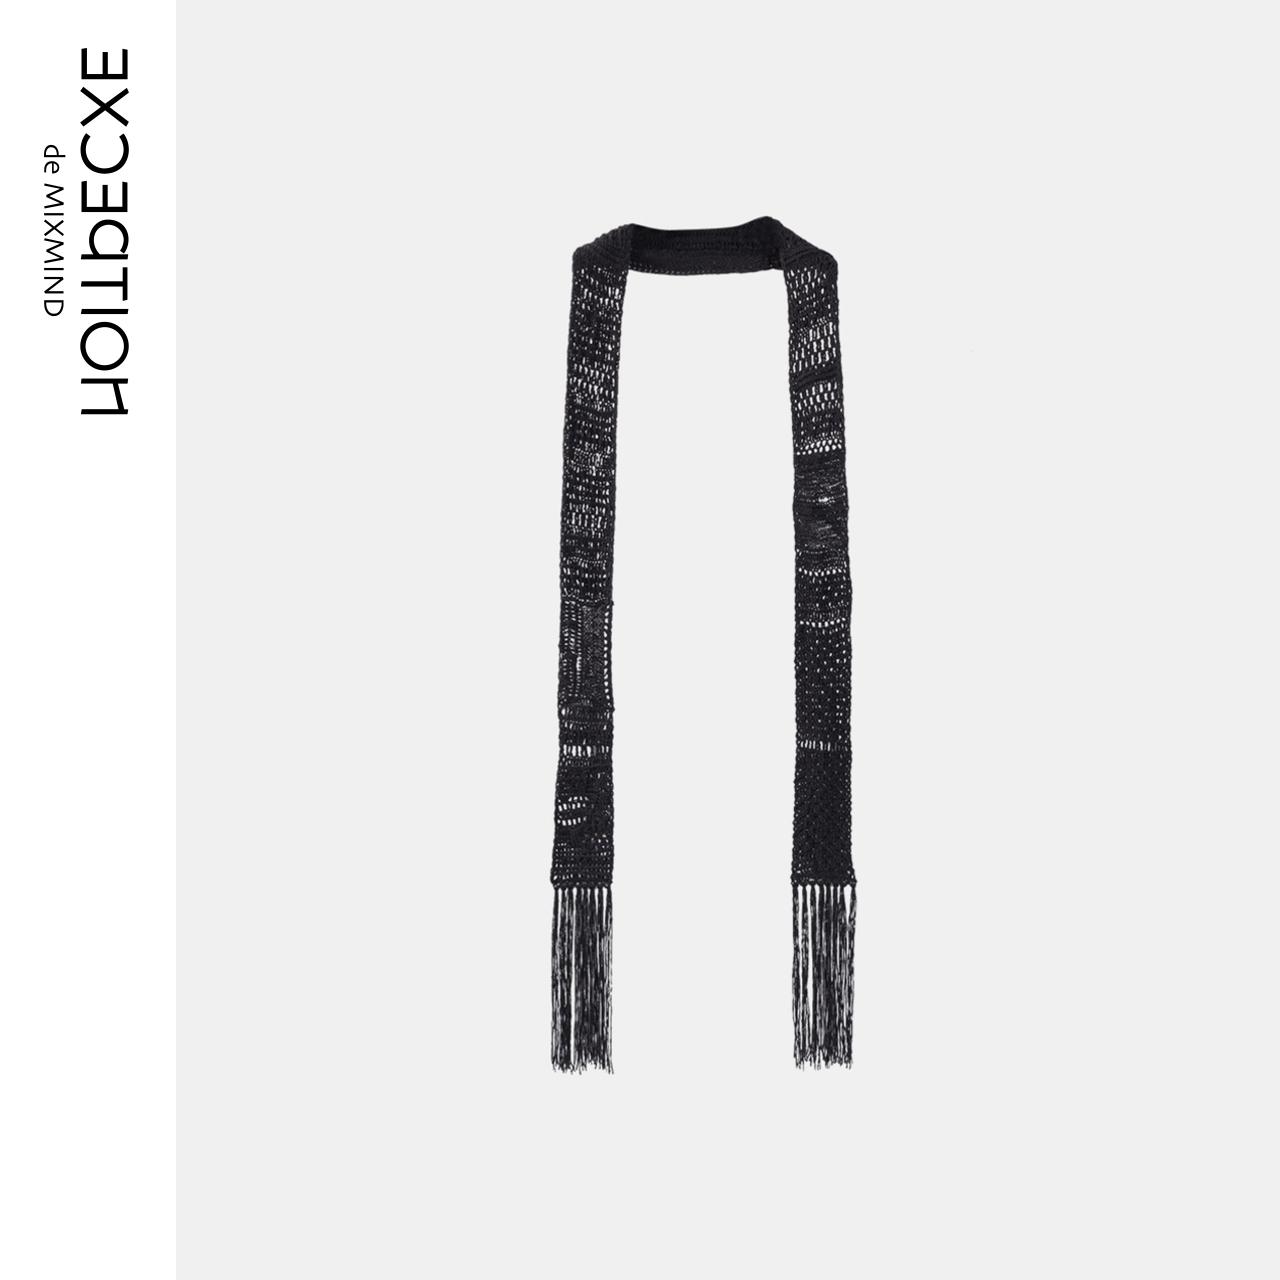 EXCEPTION例外 纯色手工编织围巾 黑色个性长流苏镂空披肩女装饰